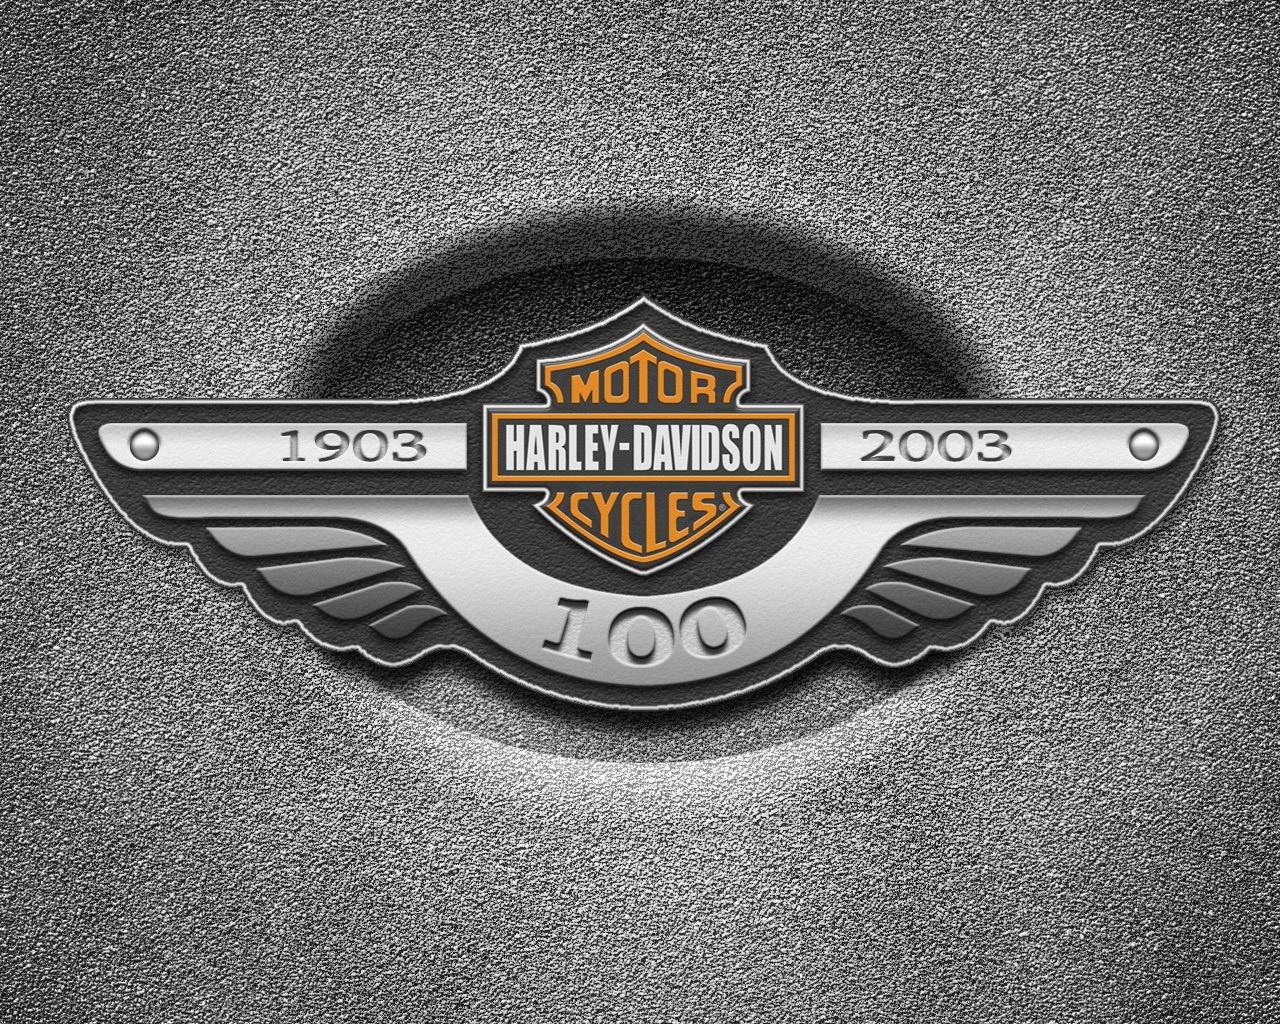 Motocycles Harley Davidson HARLEY DAVIDSON logo 017071 jpg 1280x1024